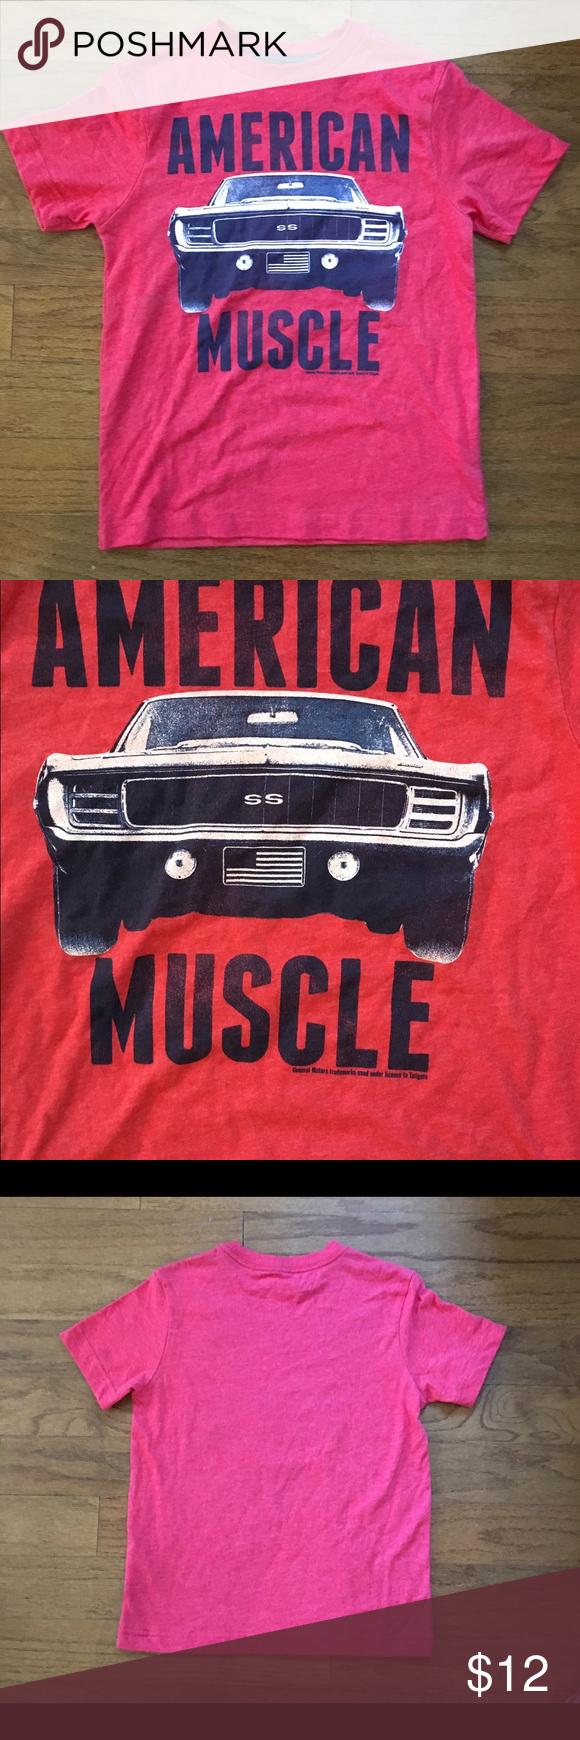 Kid's 1967 1968 Chevrolet Camaro muscle car shirt One